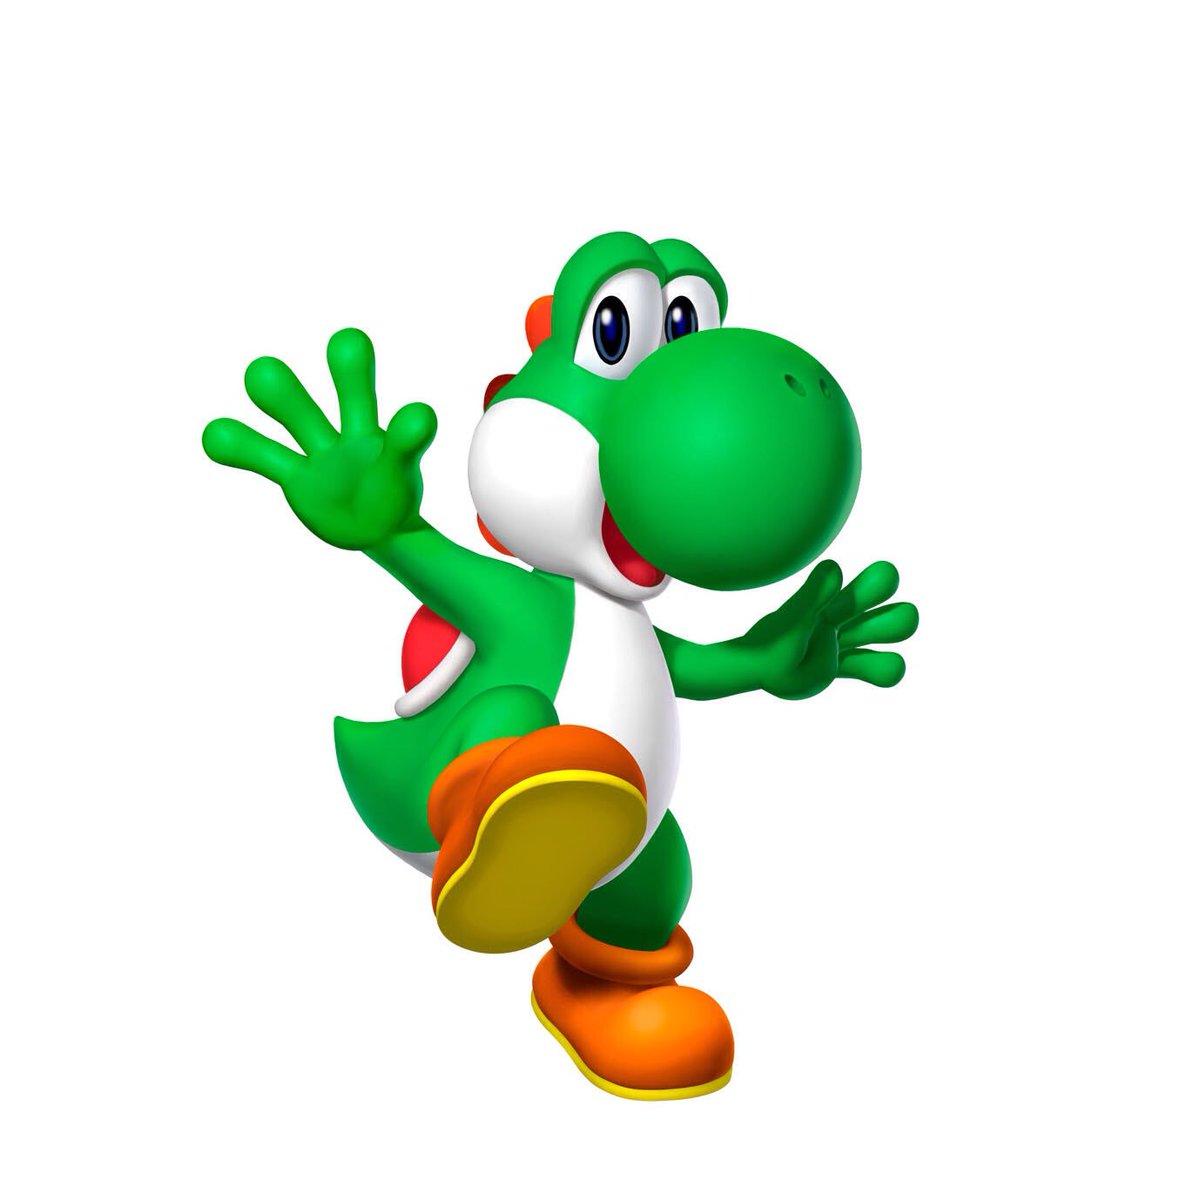 @DashieXP So today I played Mario Kart 8...